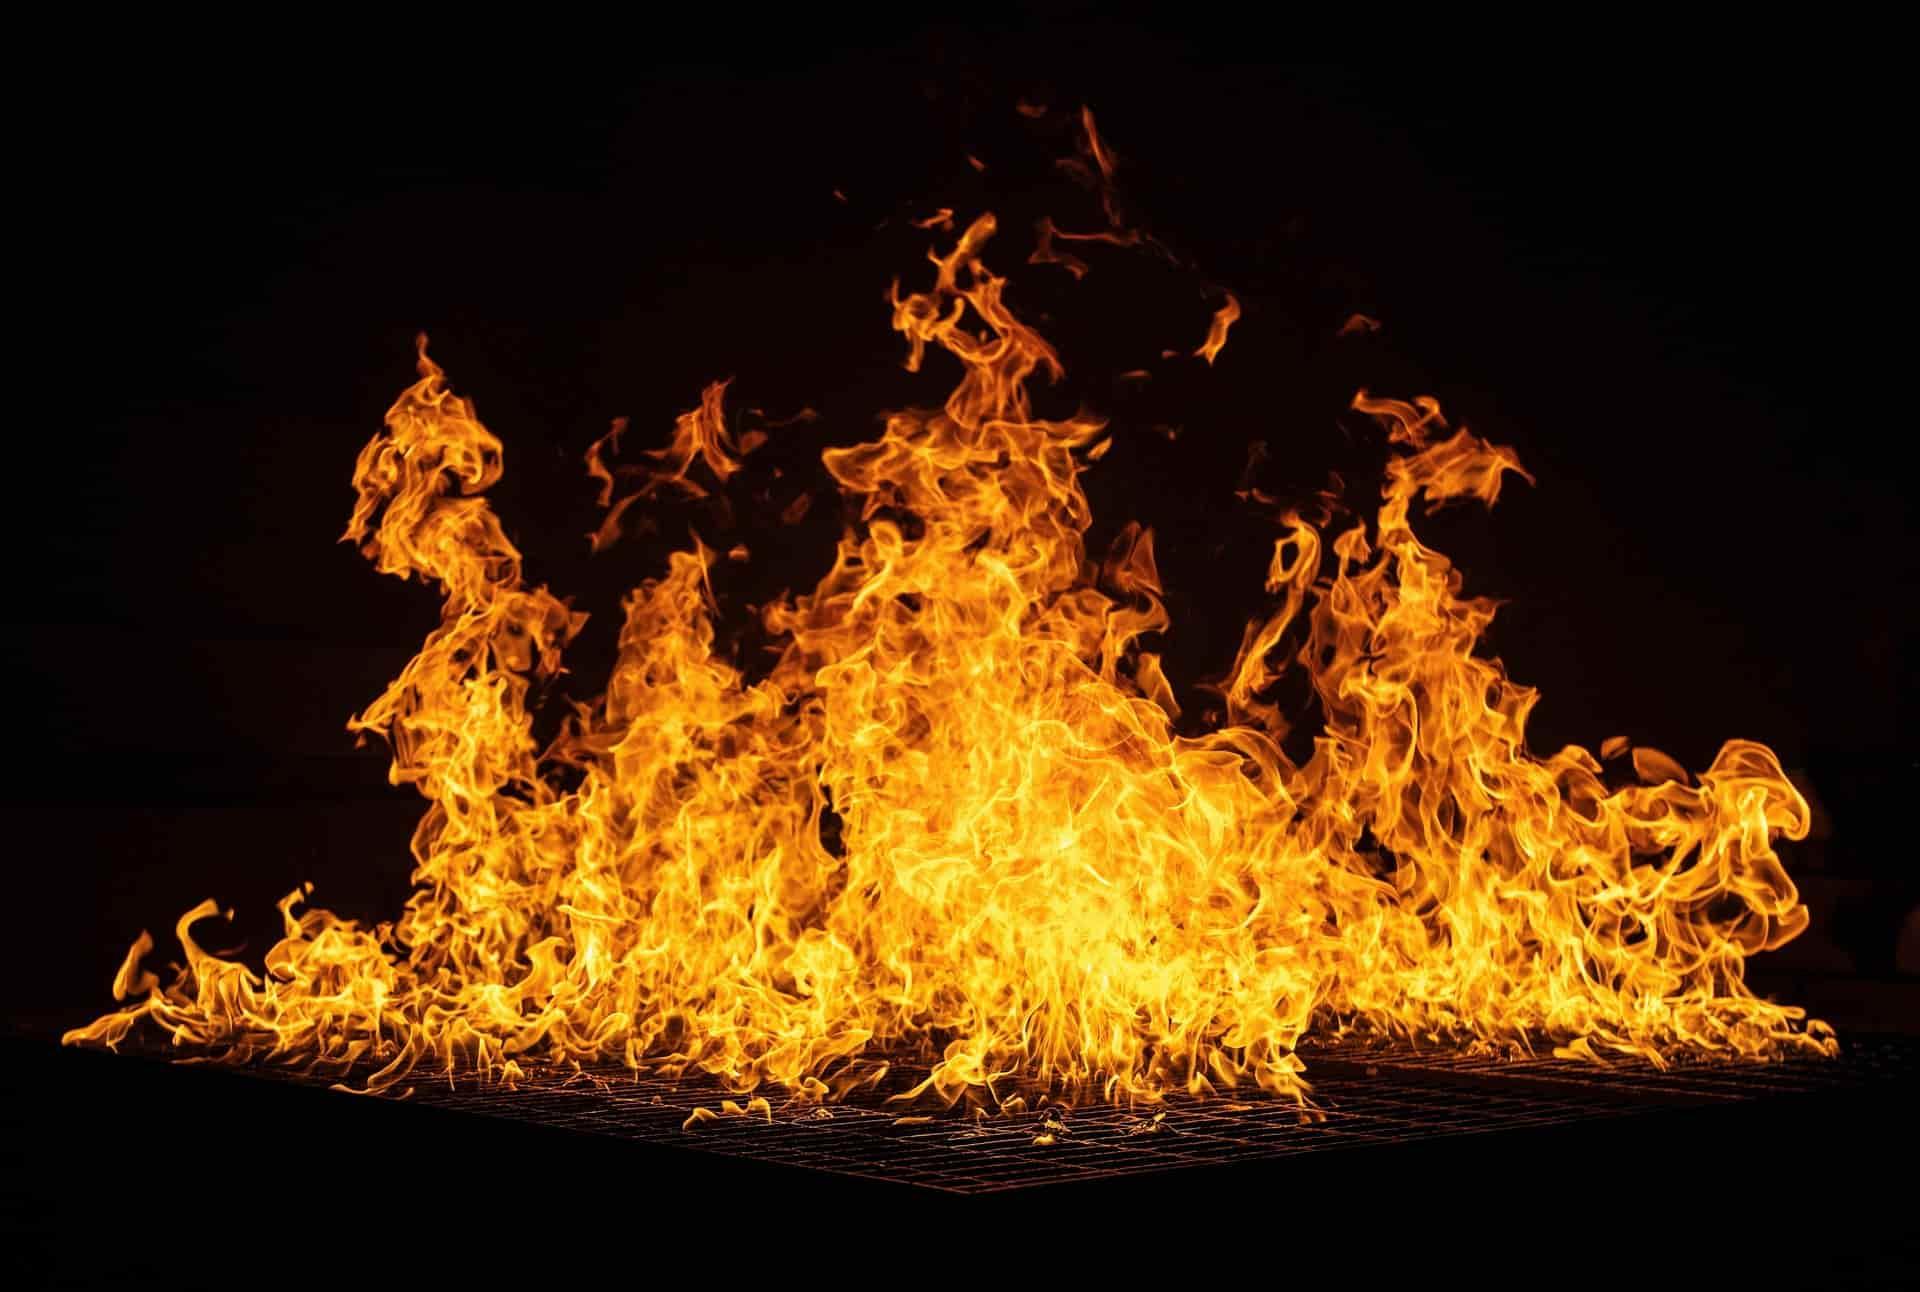 latvia, gay, fire, attack